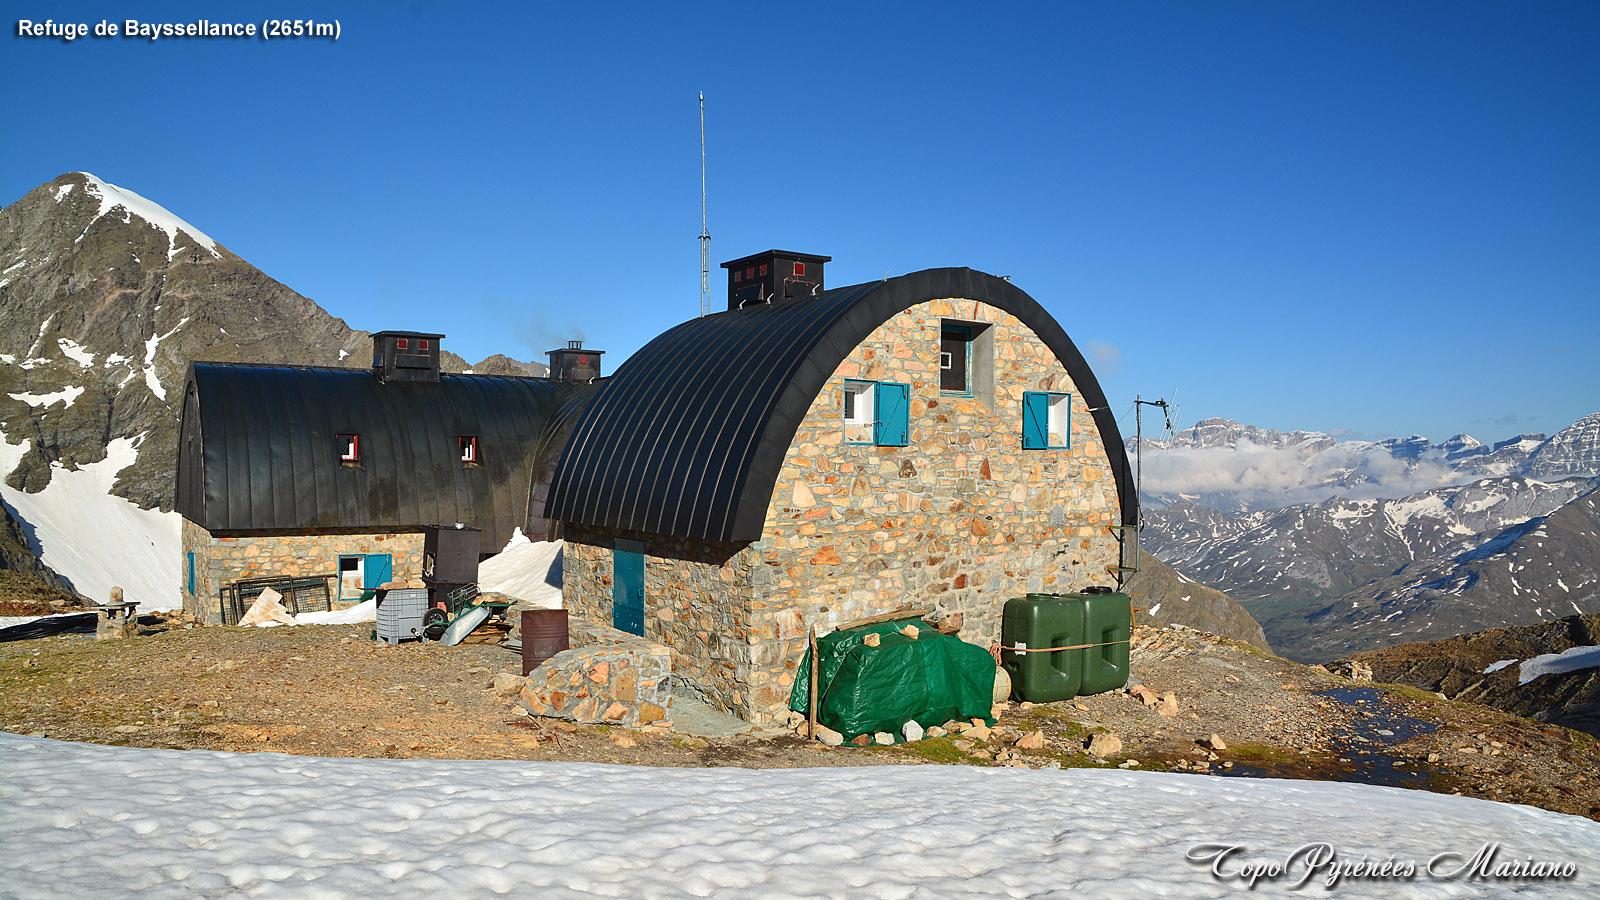 Randonnée Refuge de Bayssellance (2651m)